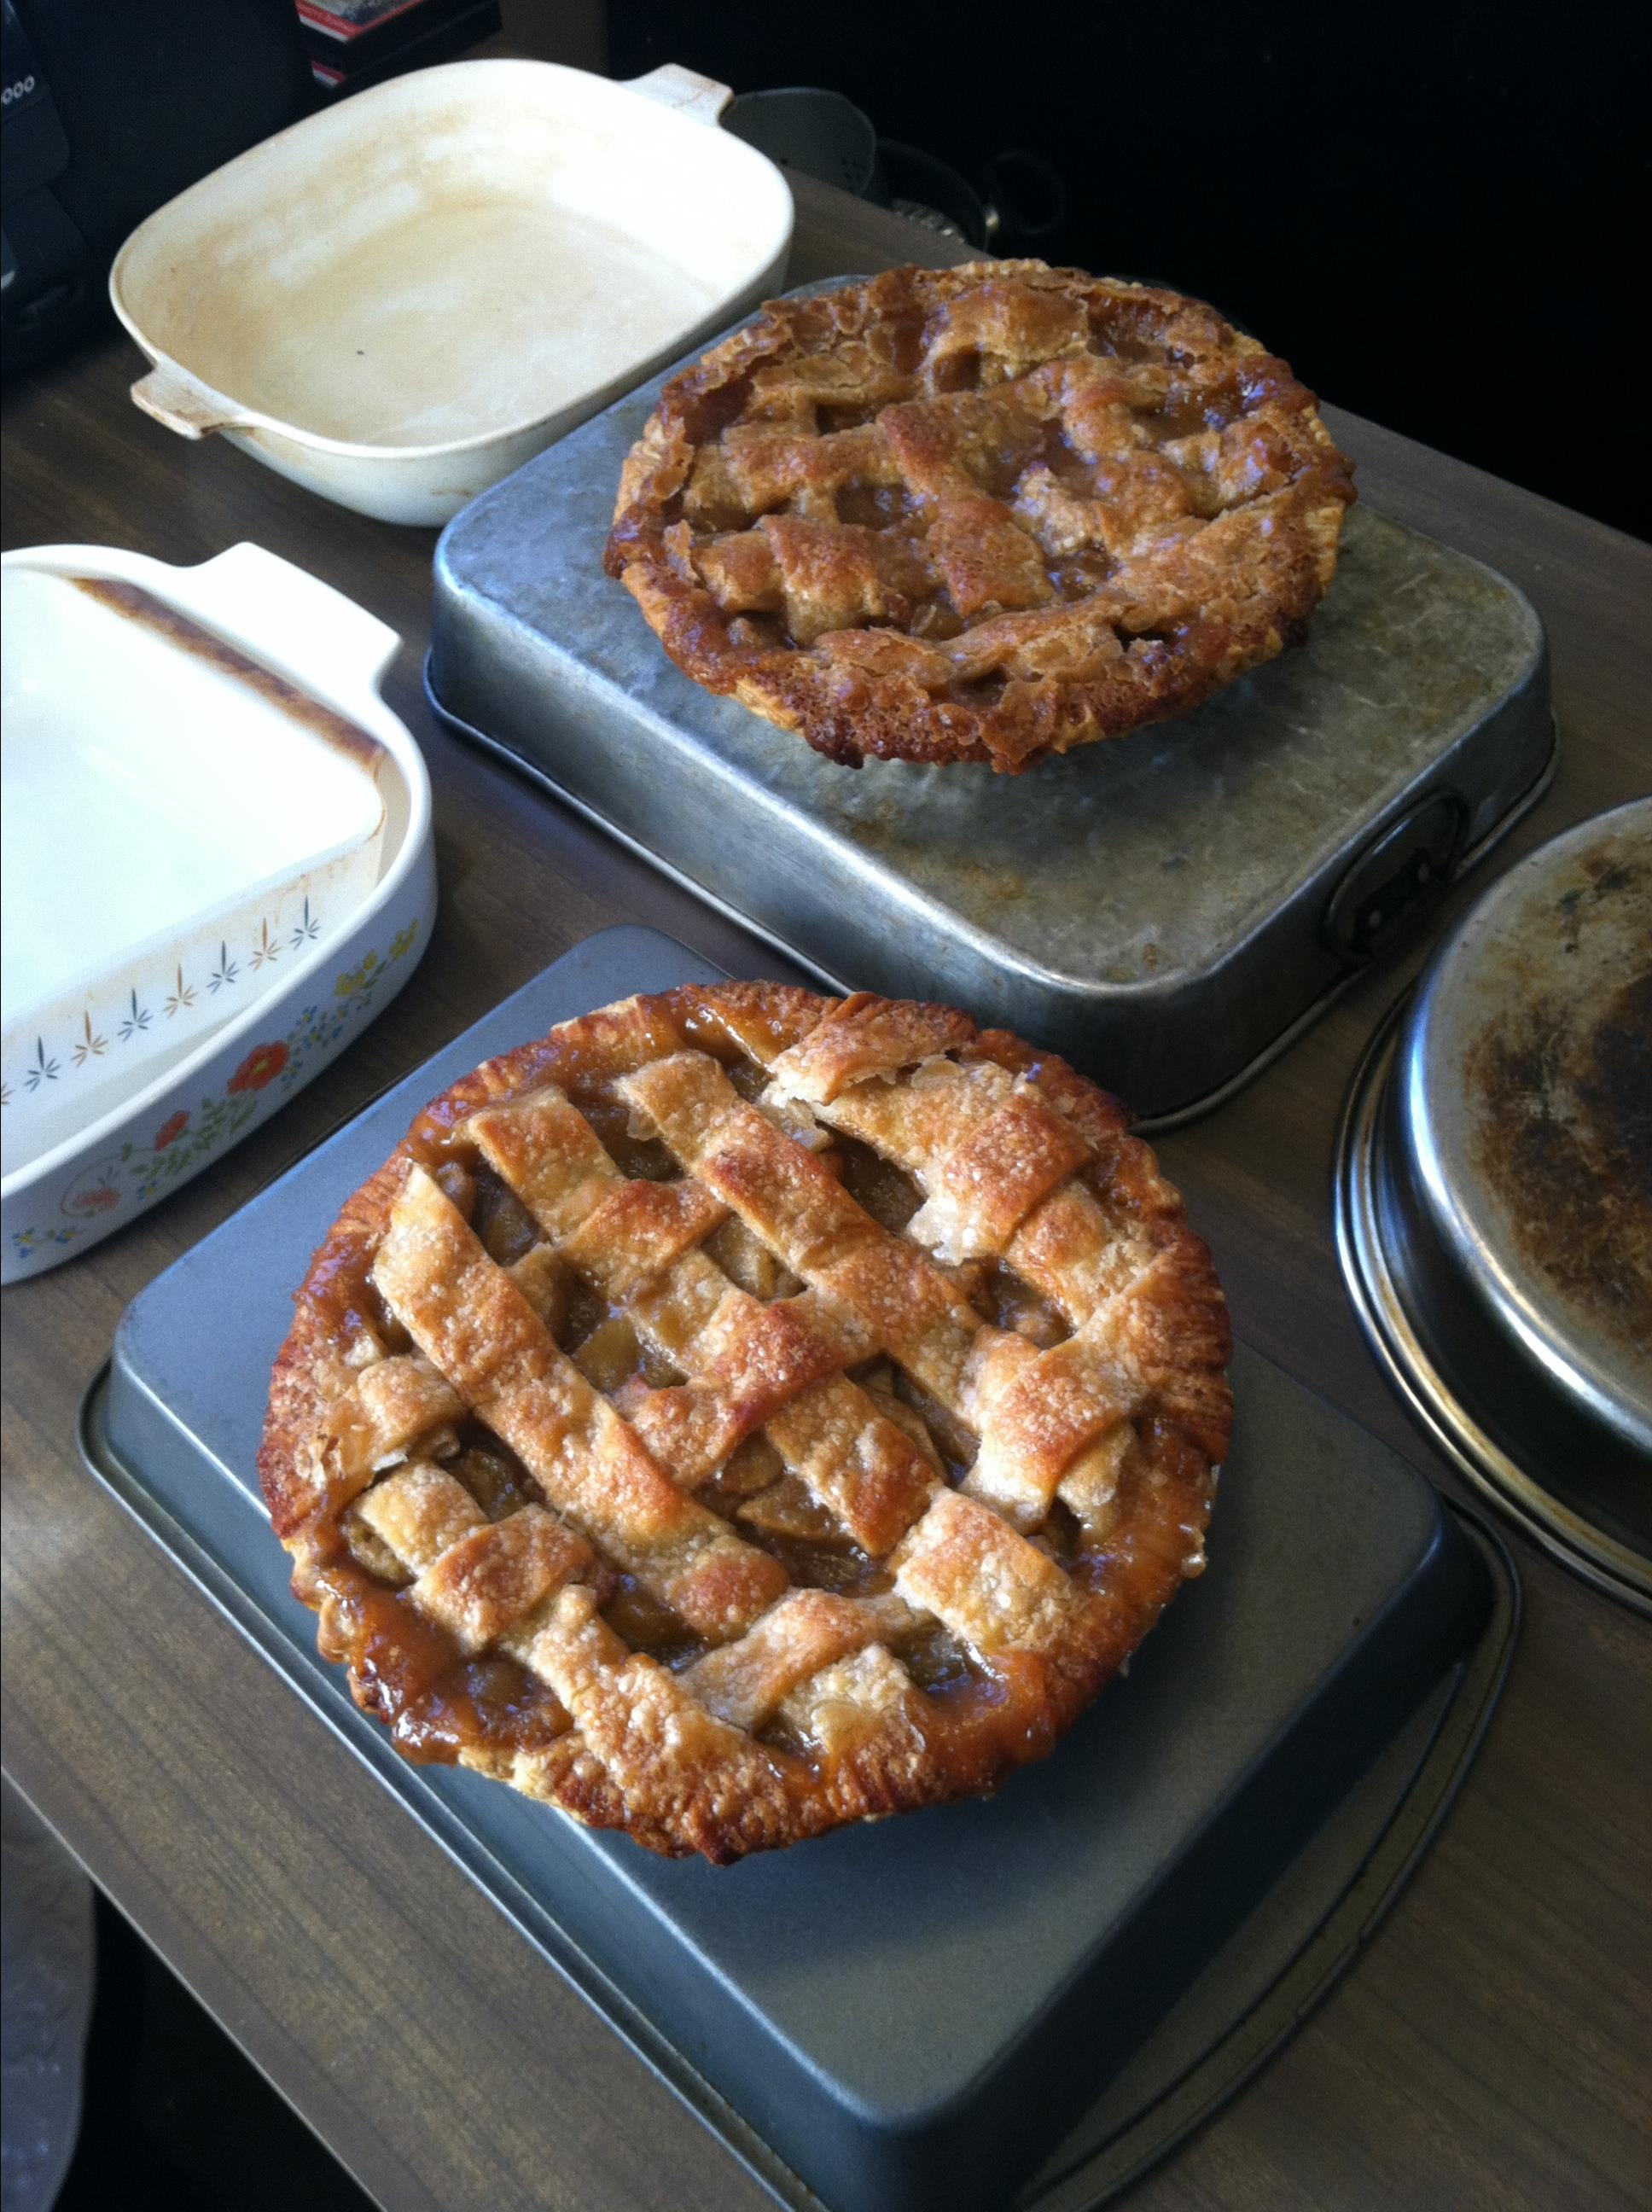 Grandma Ople's Apple Pie Connie Molitor Bergeron